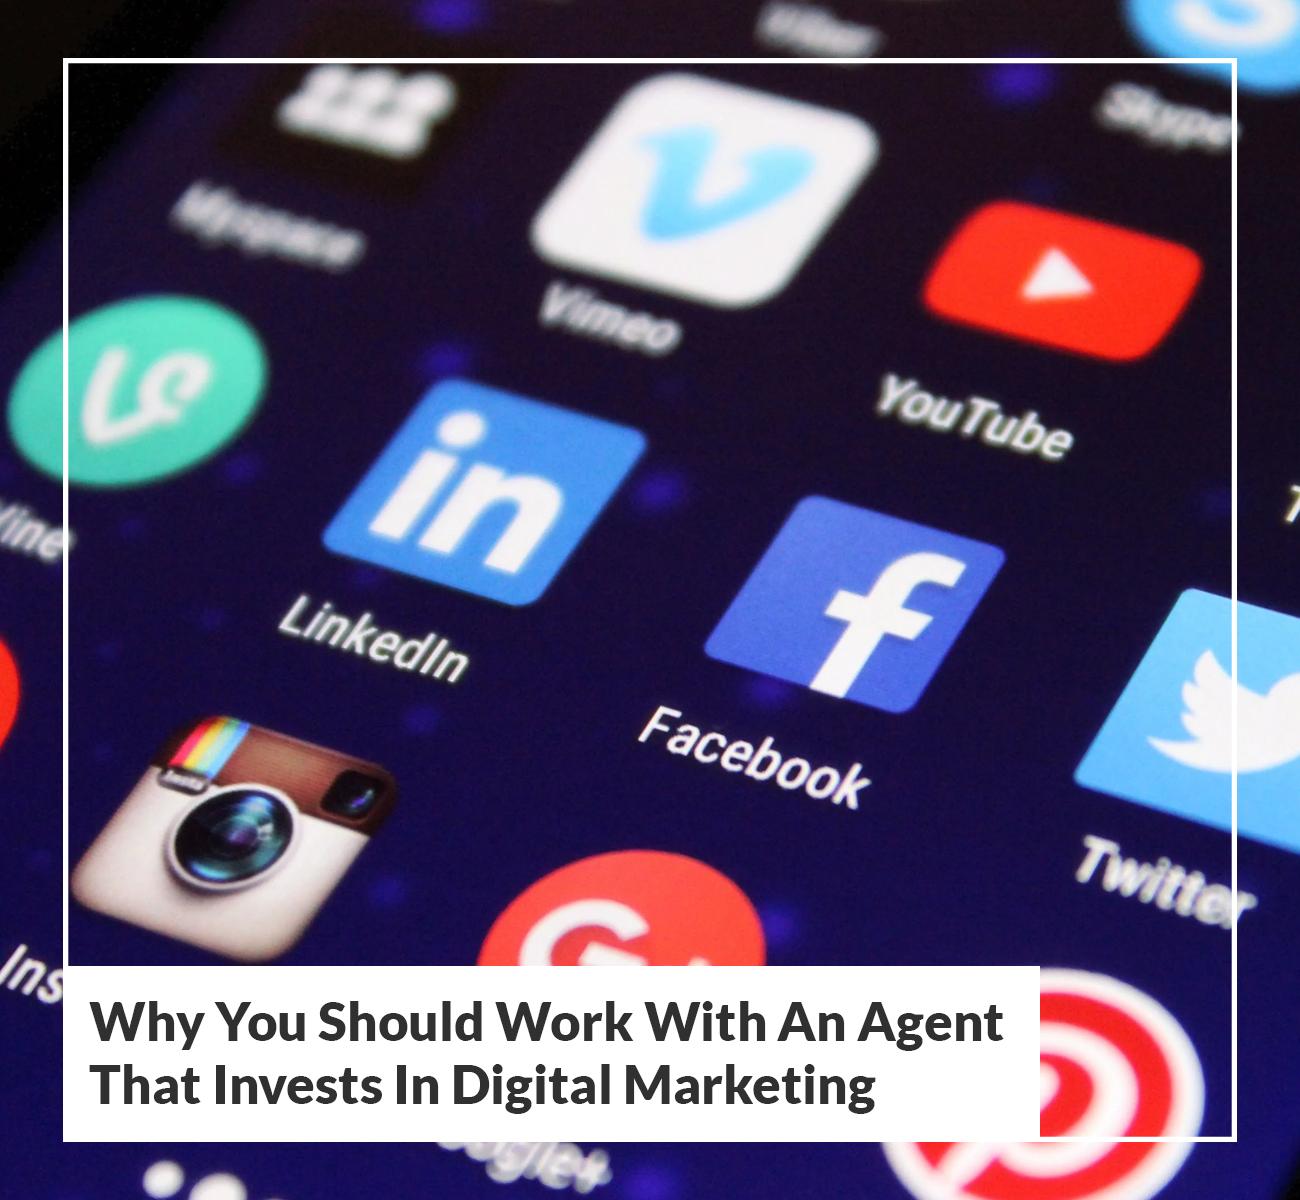 Digital Marketing Agent